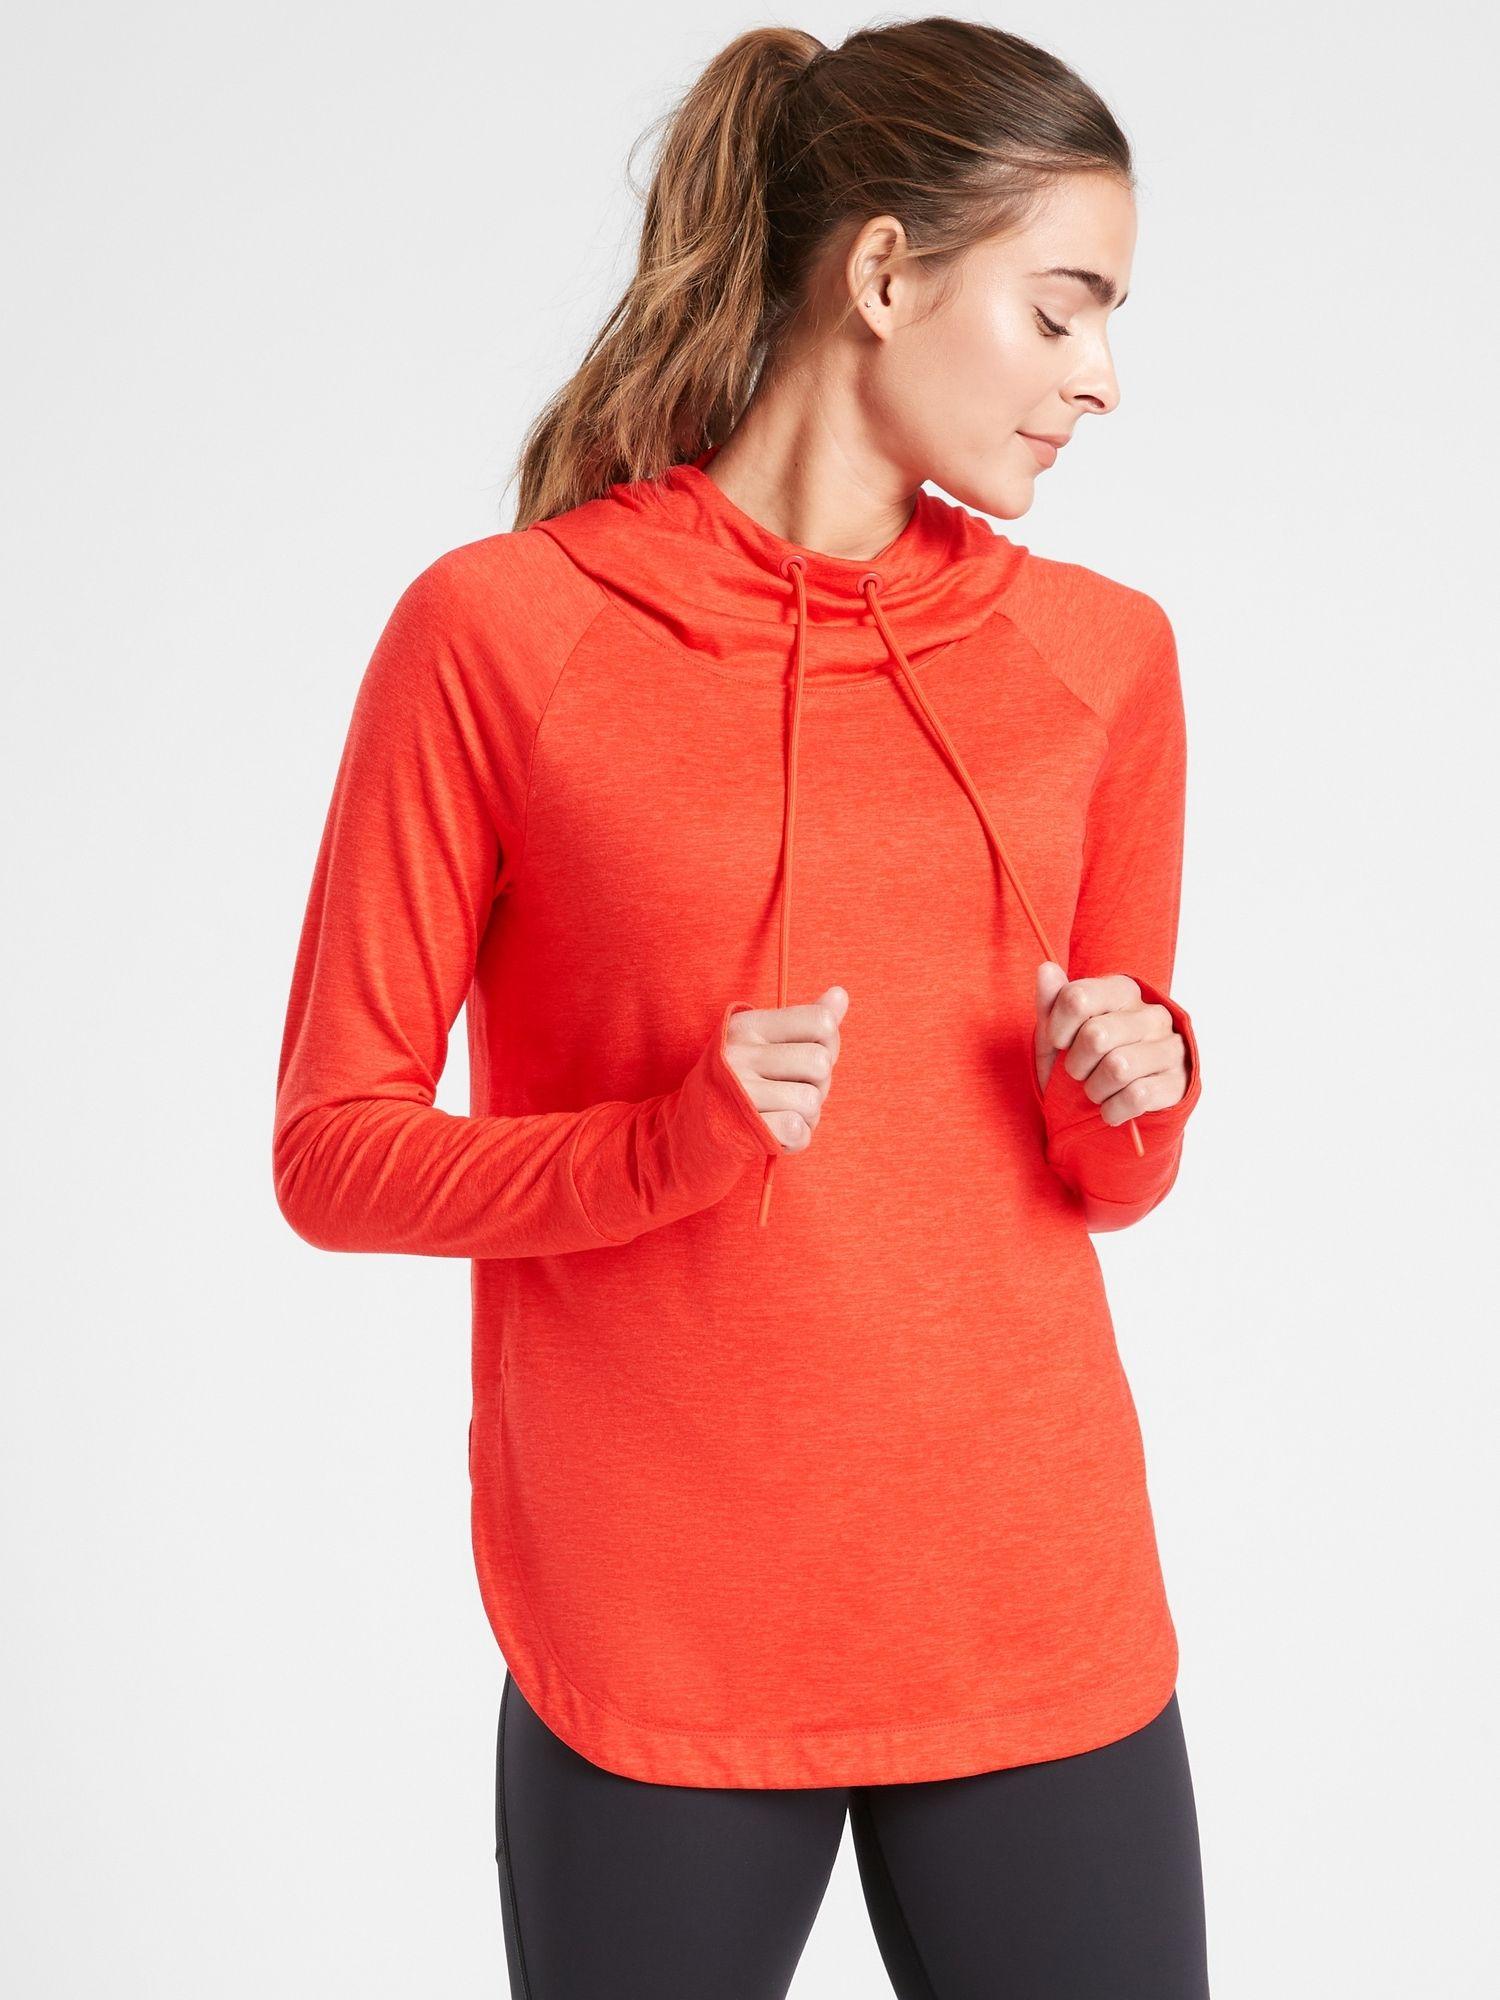 Uptempo Hoodie Sweatshirt Athleta Sweatshirts Hoodie Workout Tops For Women Running Clothes Women [ 2000 x 1500 Pixel ]